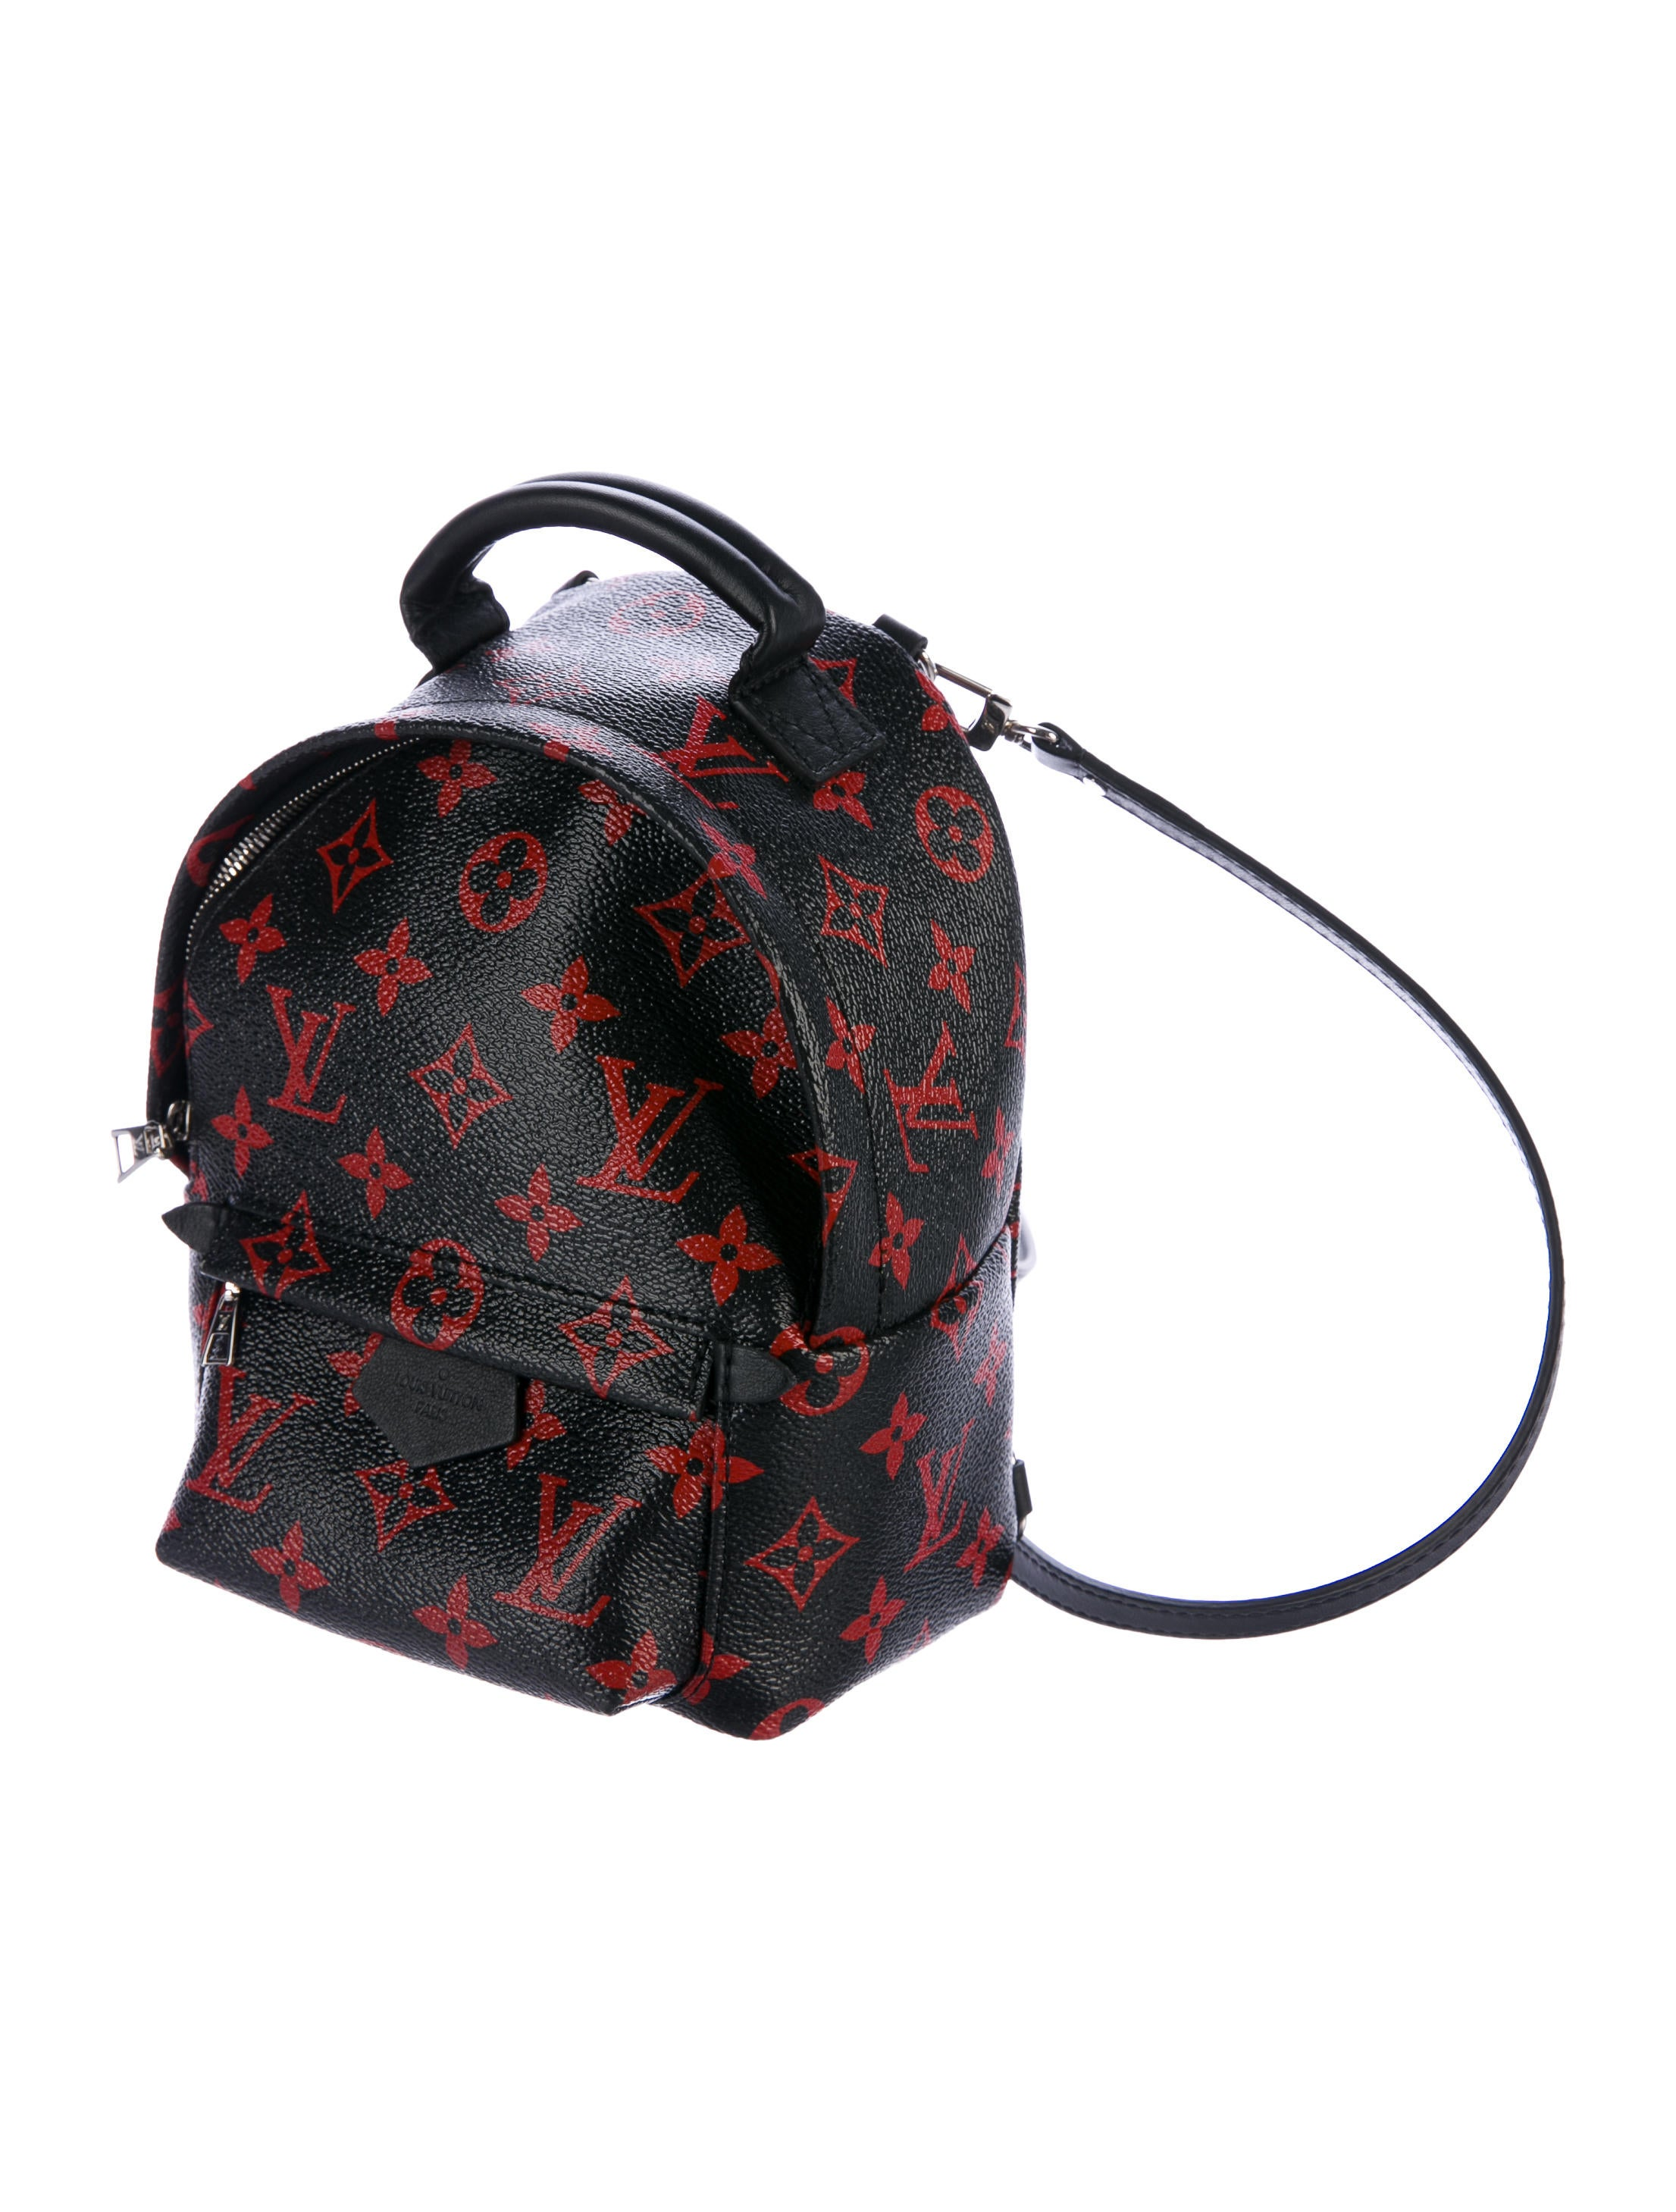 783b8dadc0f0 Lv Palm Springs Backpack Mini Price Uk- Fenix Toulouse Handball